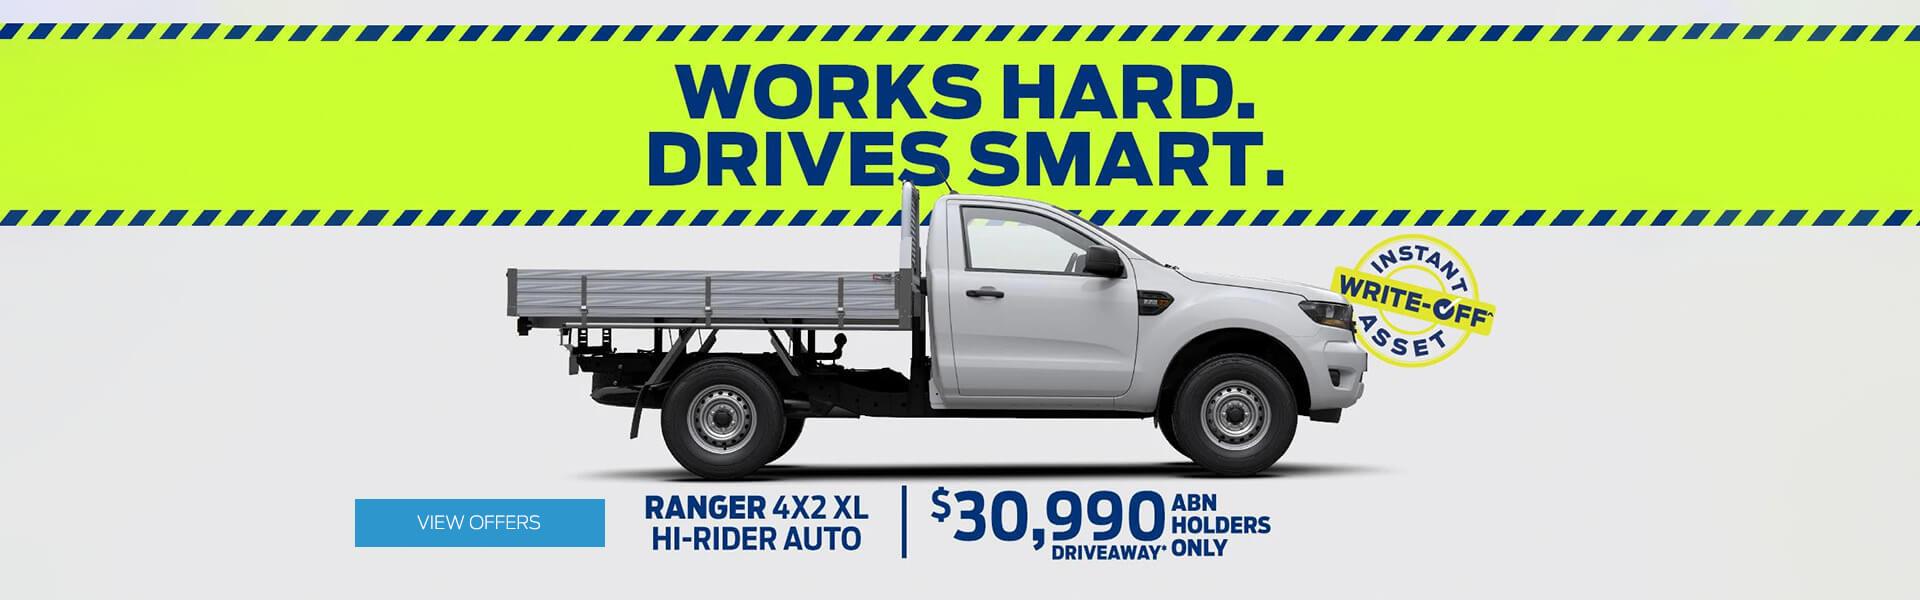 Works Hard. Drives Smart. Ranger 4x2 XL Hi-Rider Auto